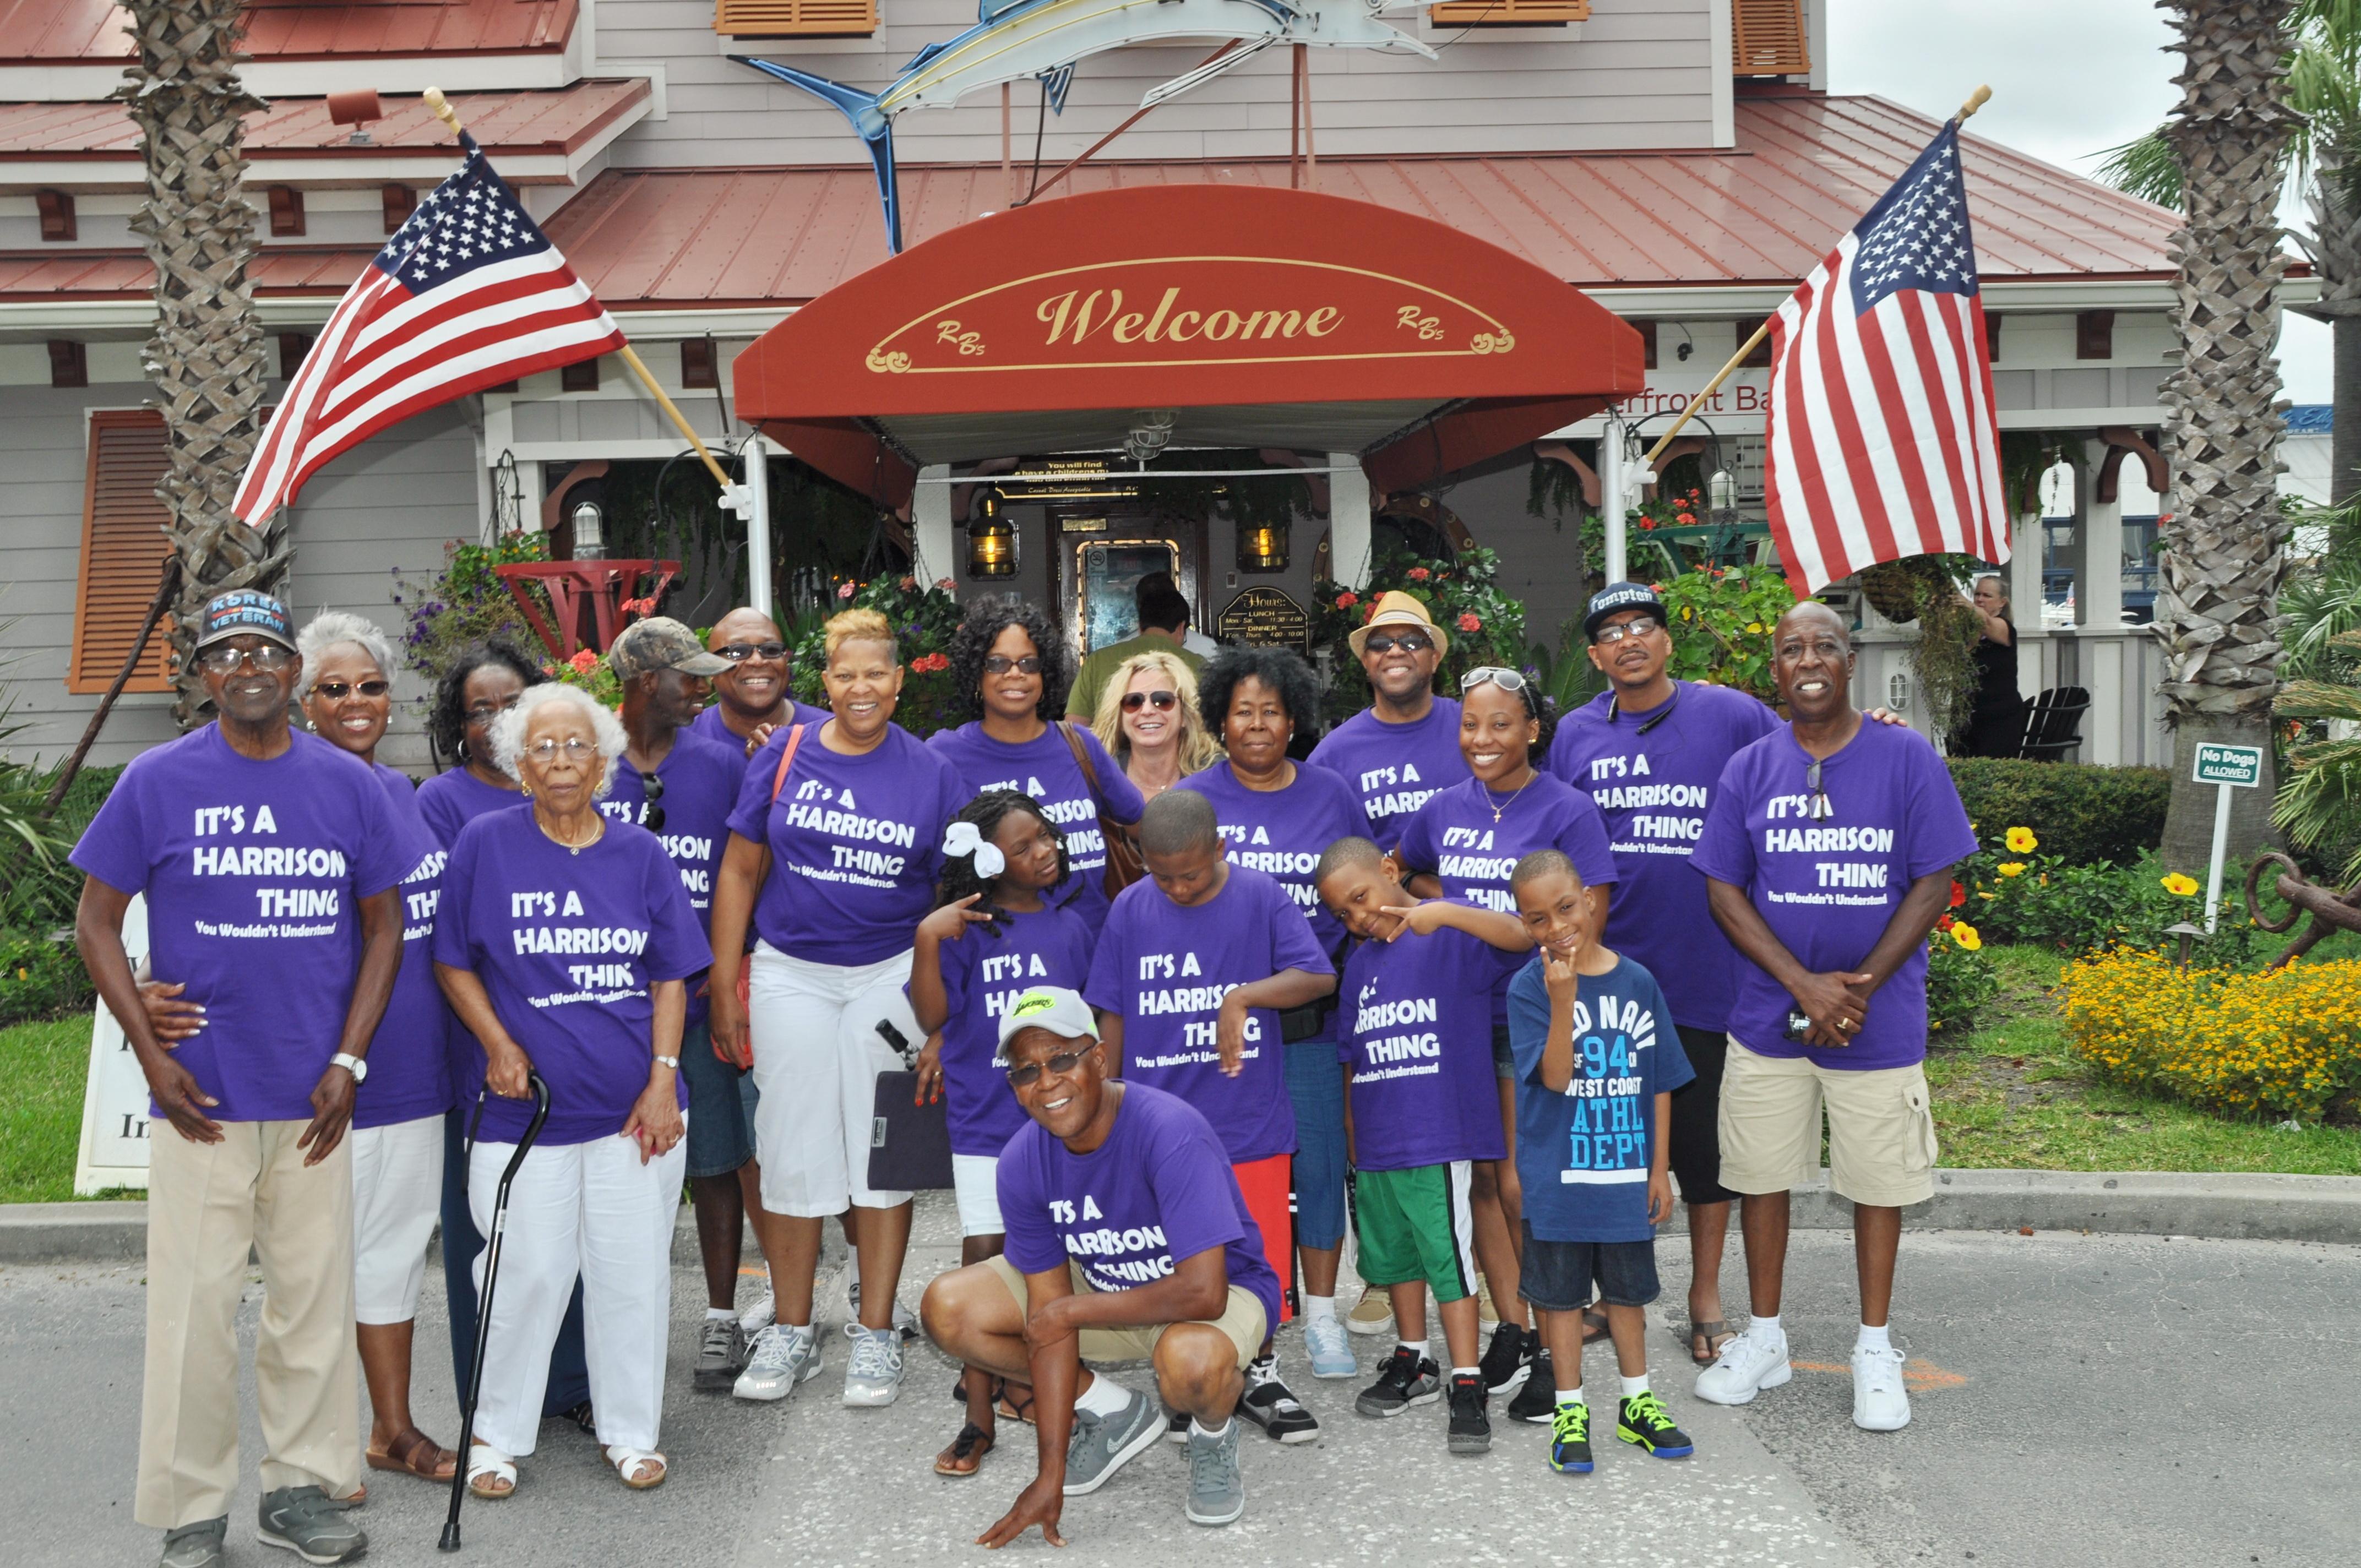 Harrison Family Reunion Its A Family Affair